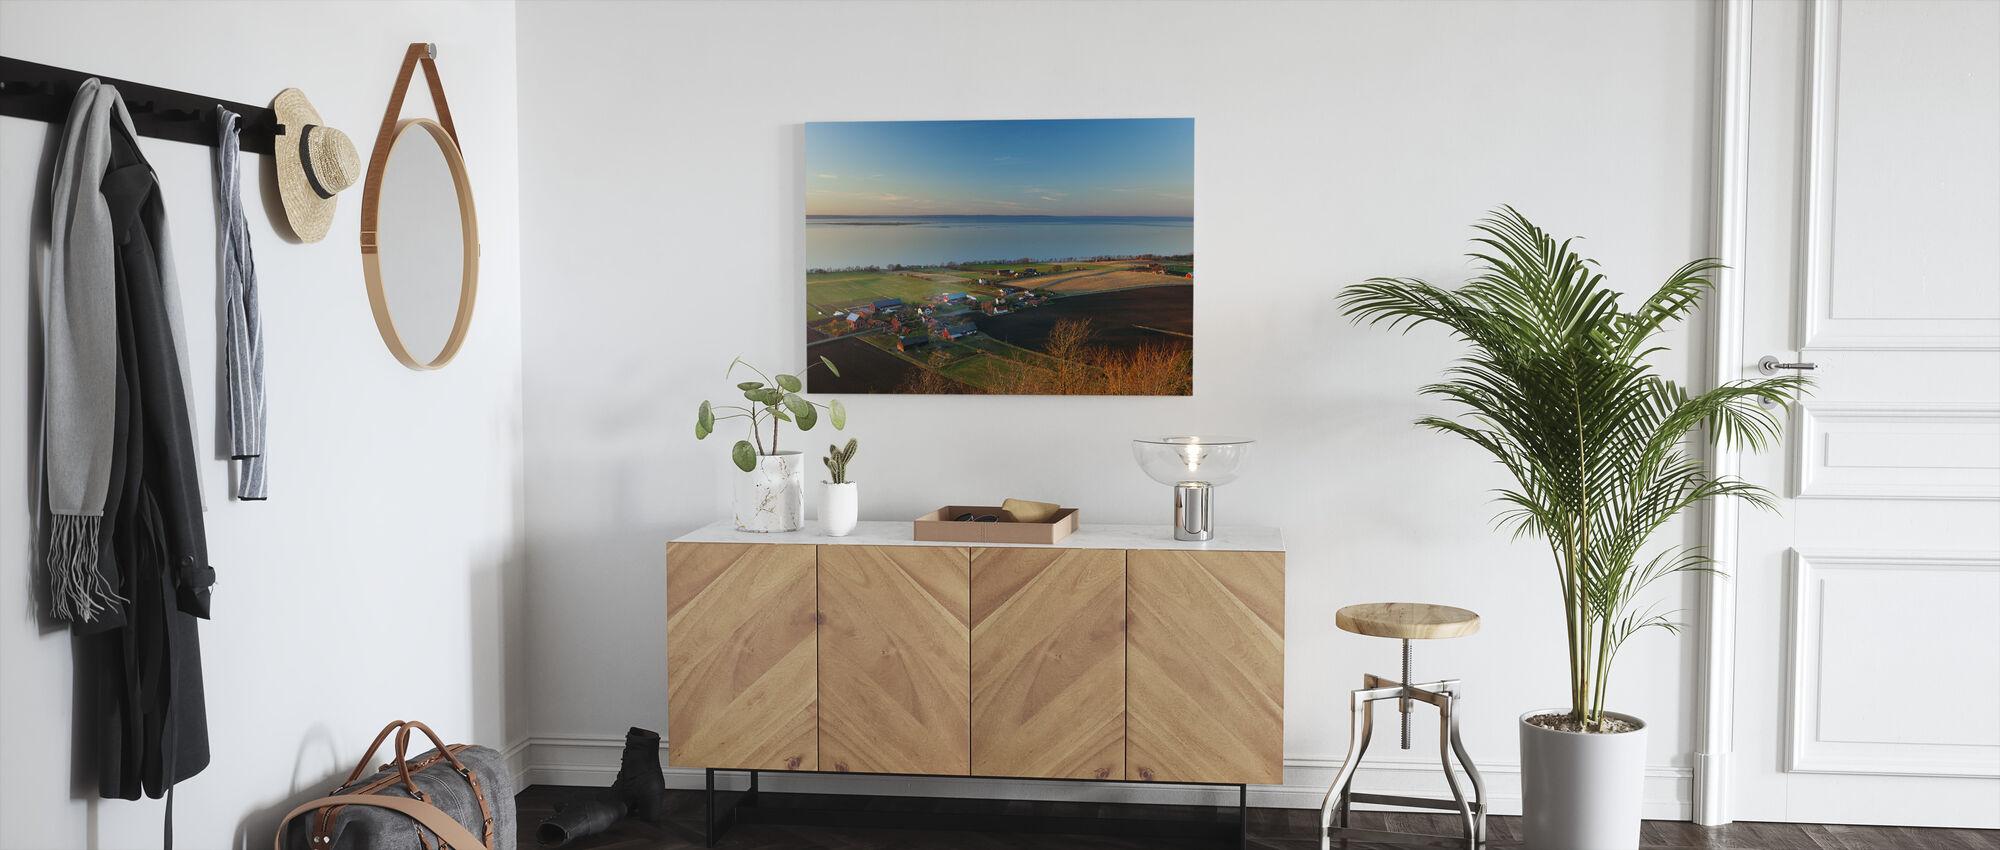 Farmhouses in Småland, Sweden - Canvas print - Hallway